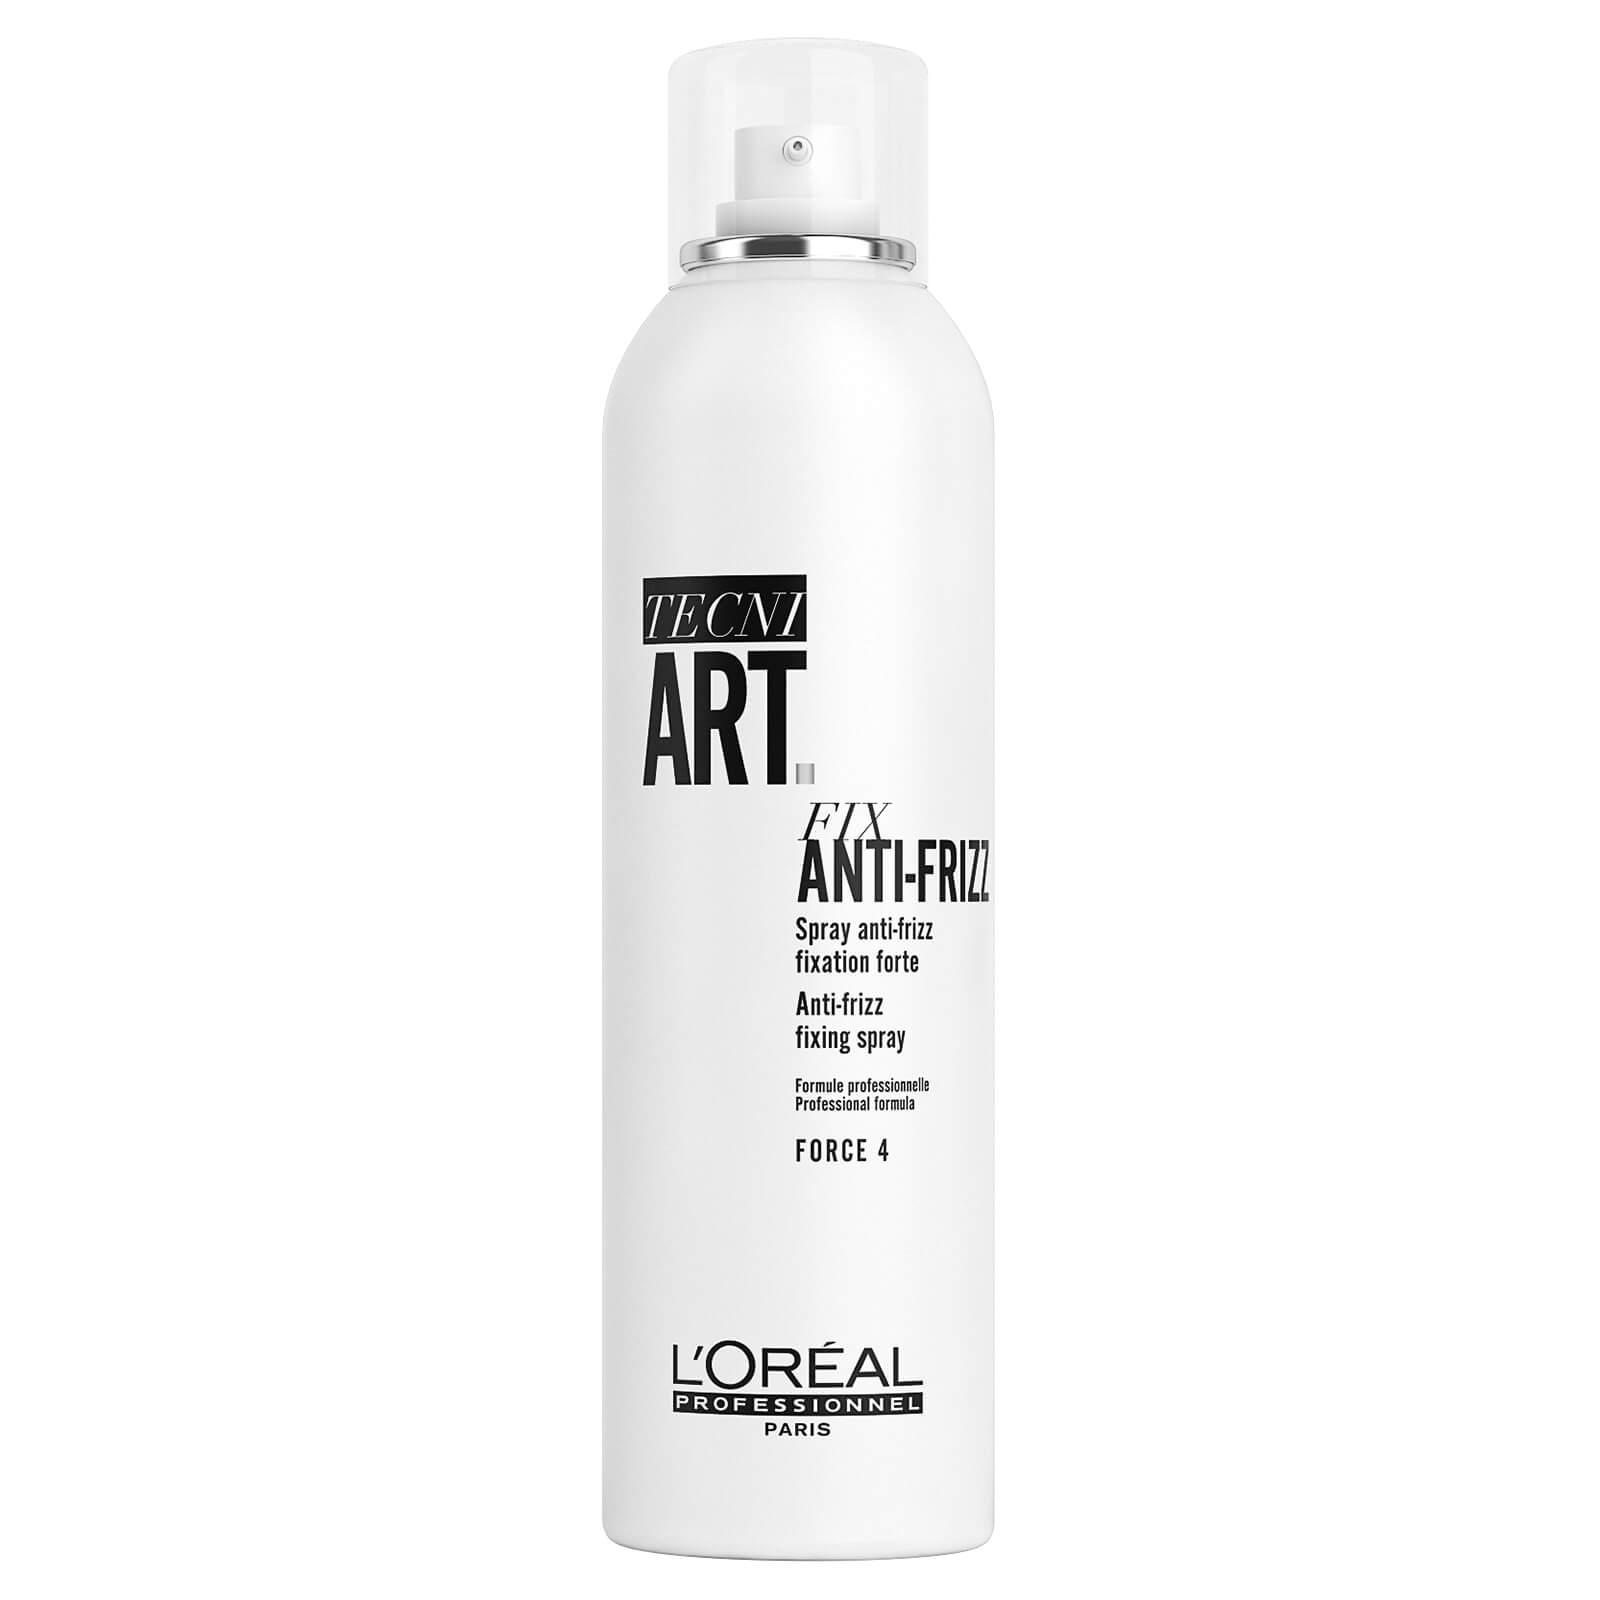 Spray anti-frizz de L'Oréal Professionnel